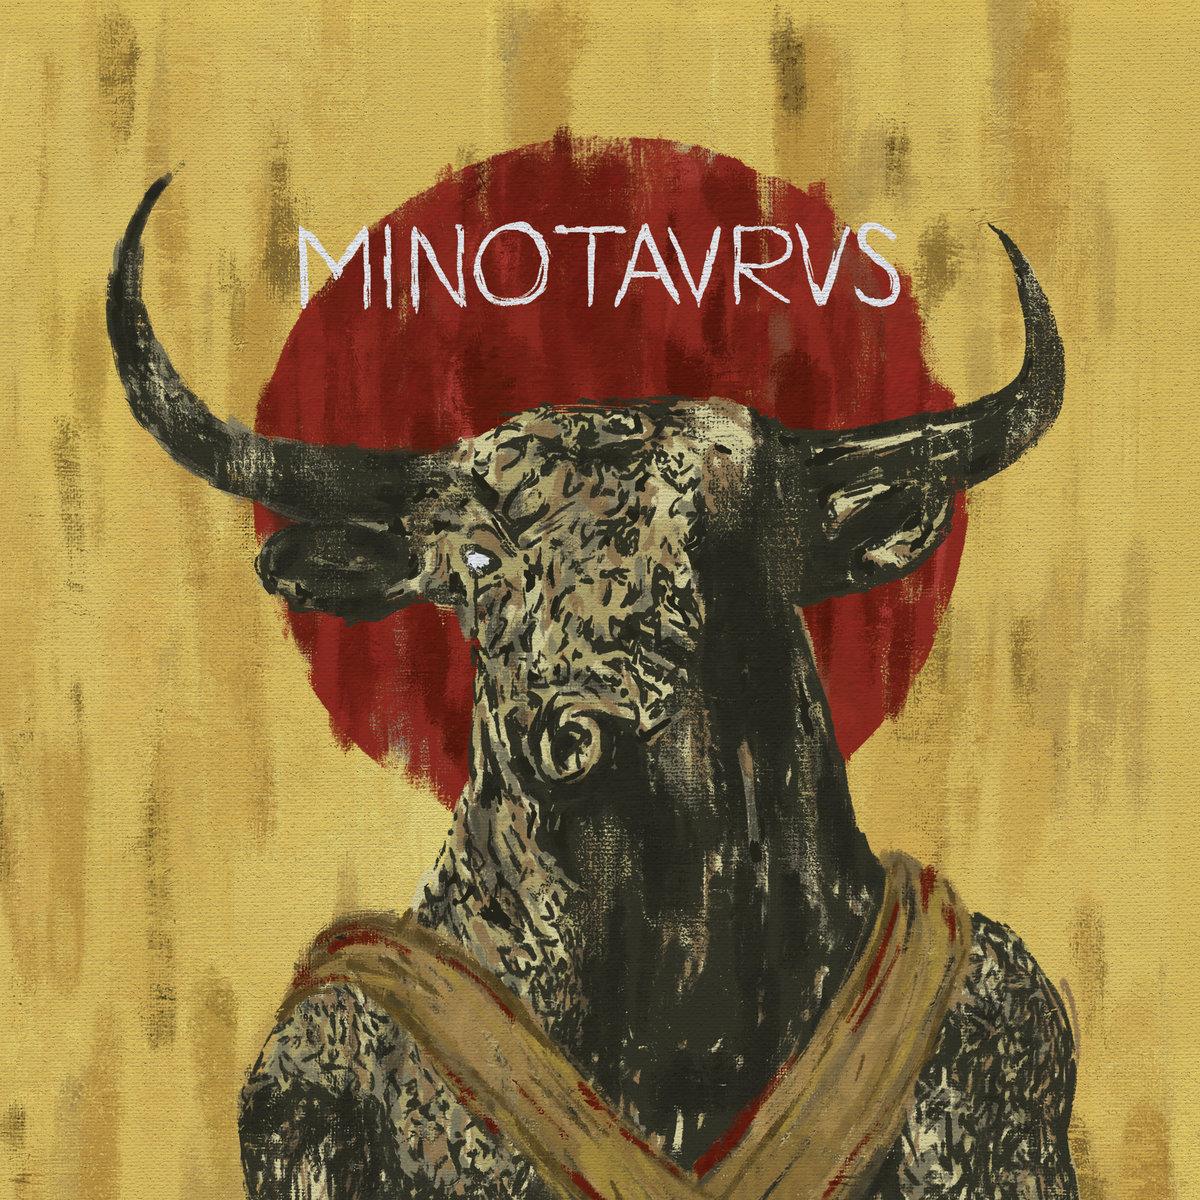 Mansur - Minotavrvs (Denovali Records/Cargo, 28.05.2021)